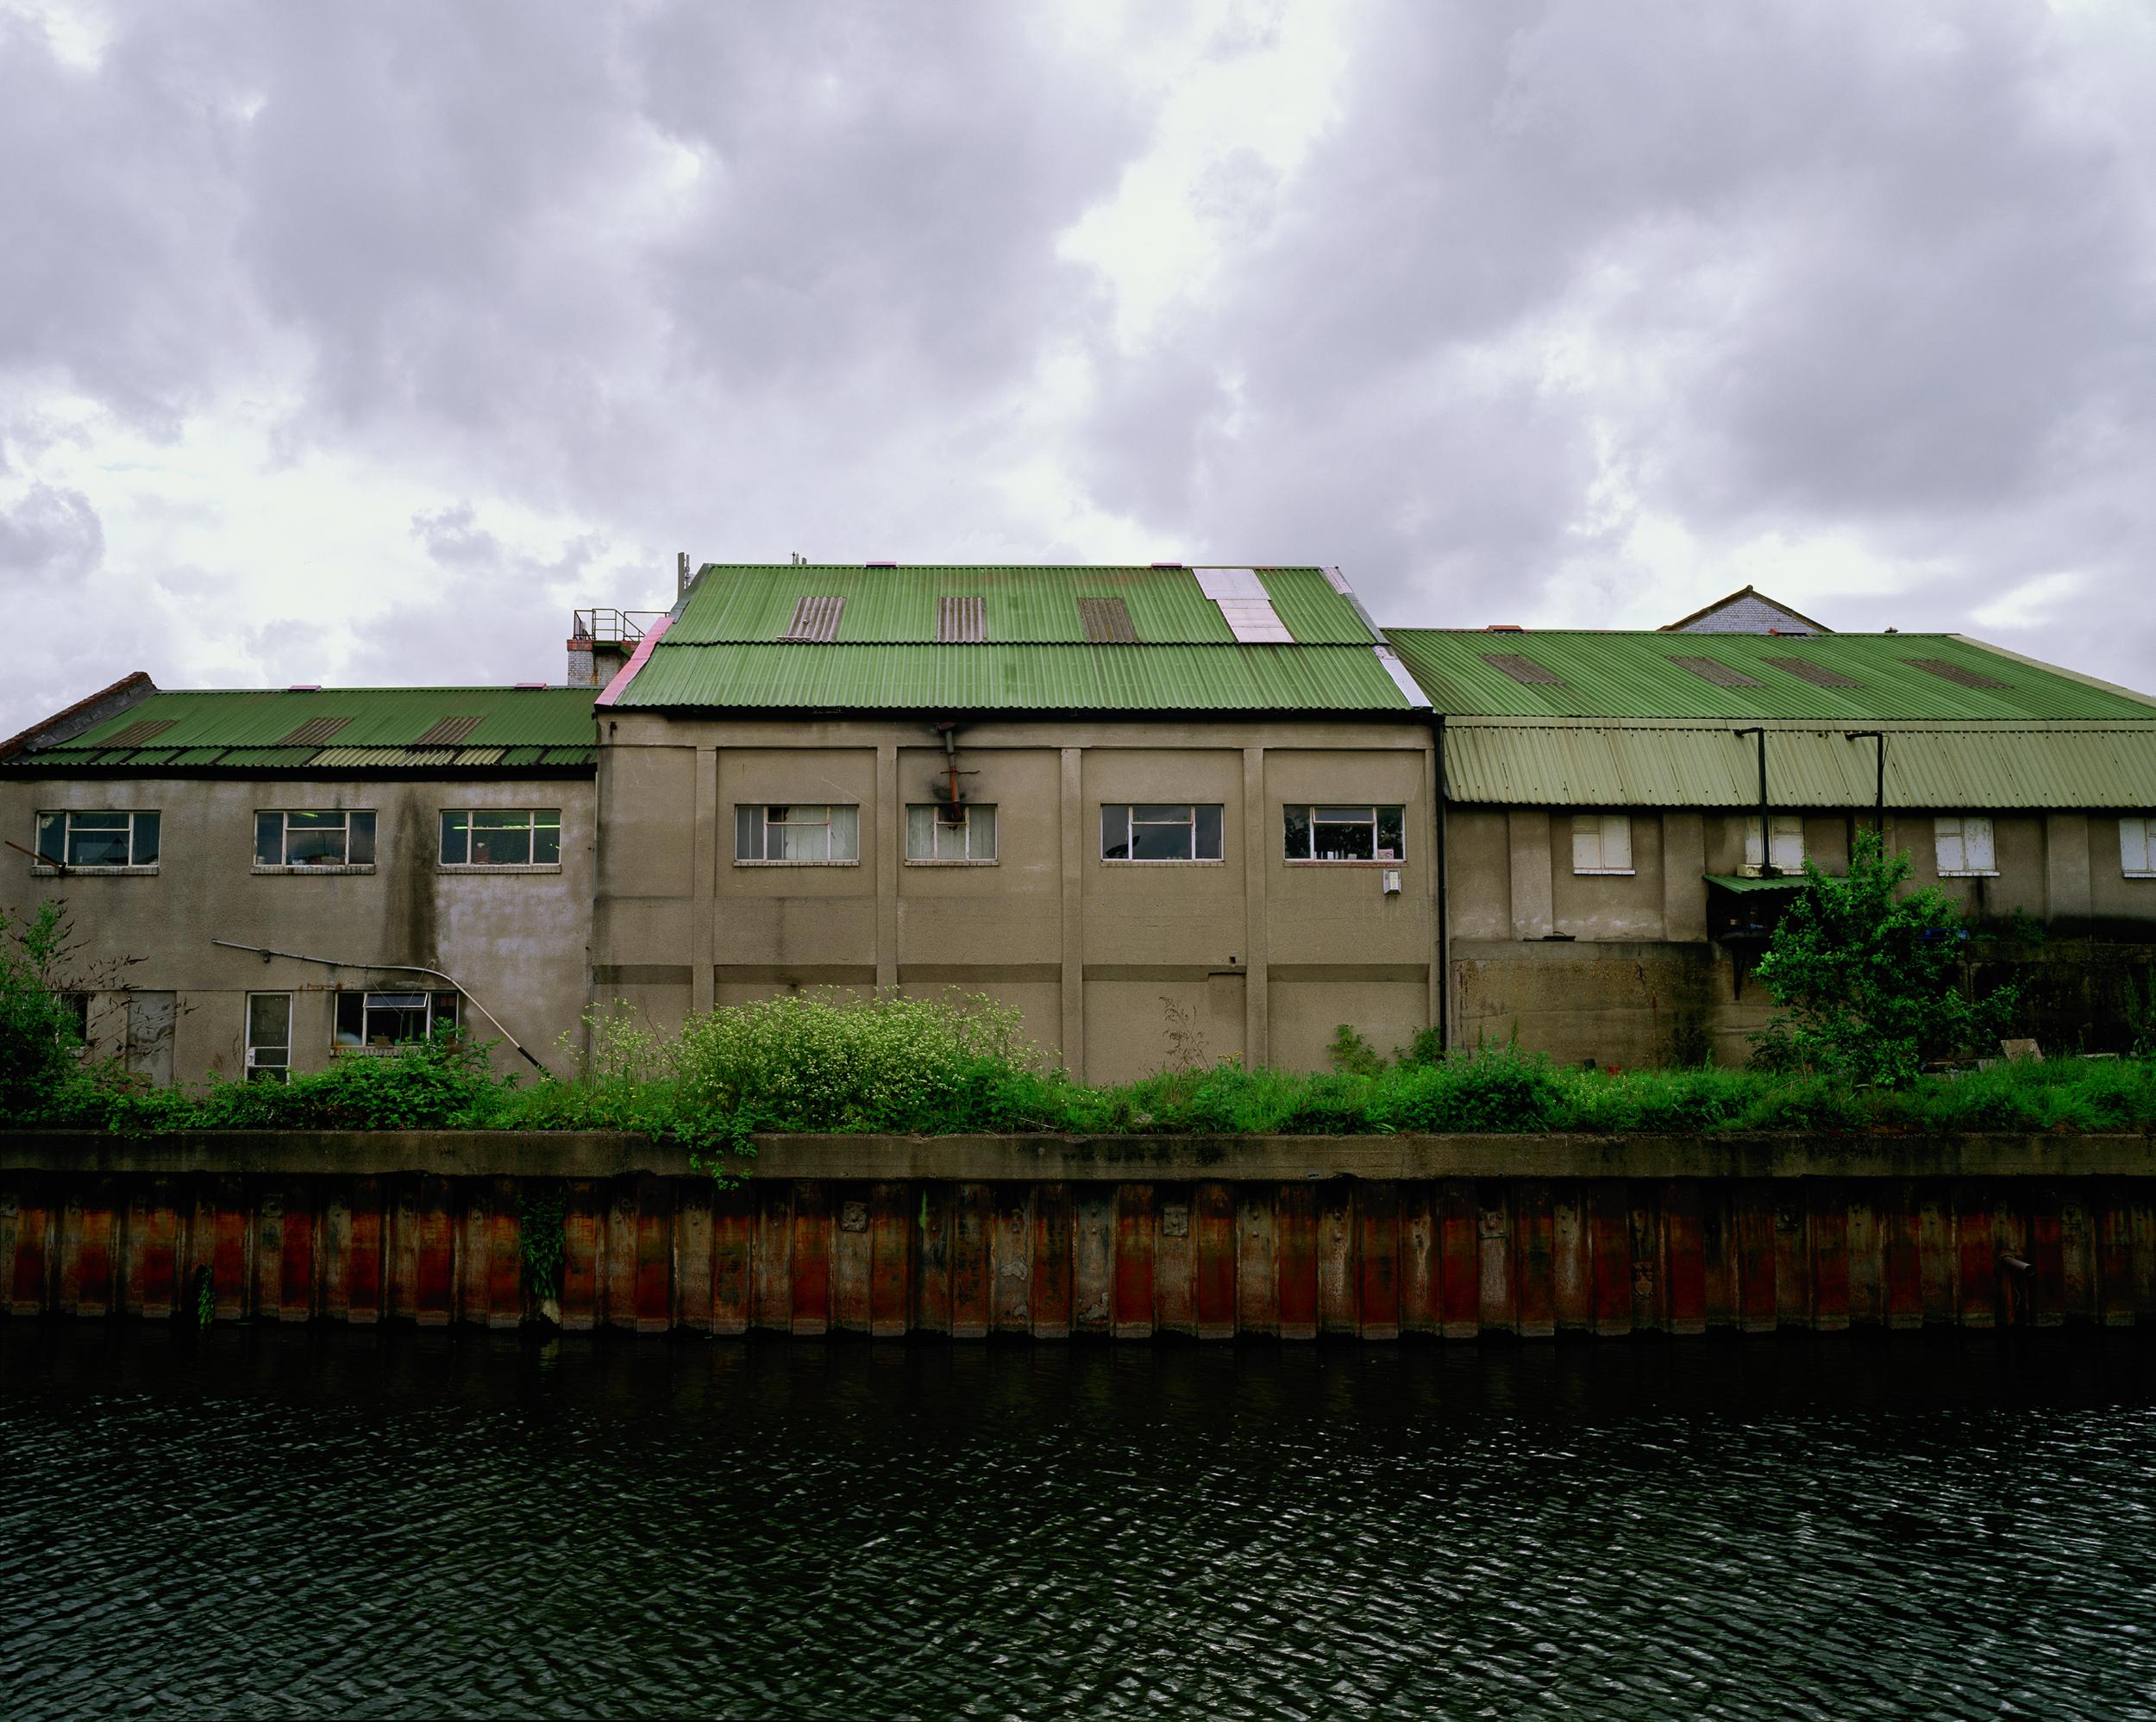 Derelict Factory, Lee Navigation (2005)